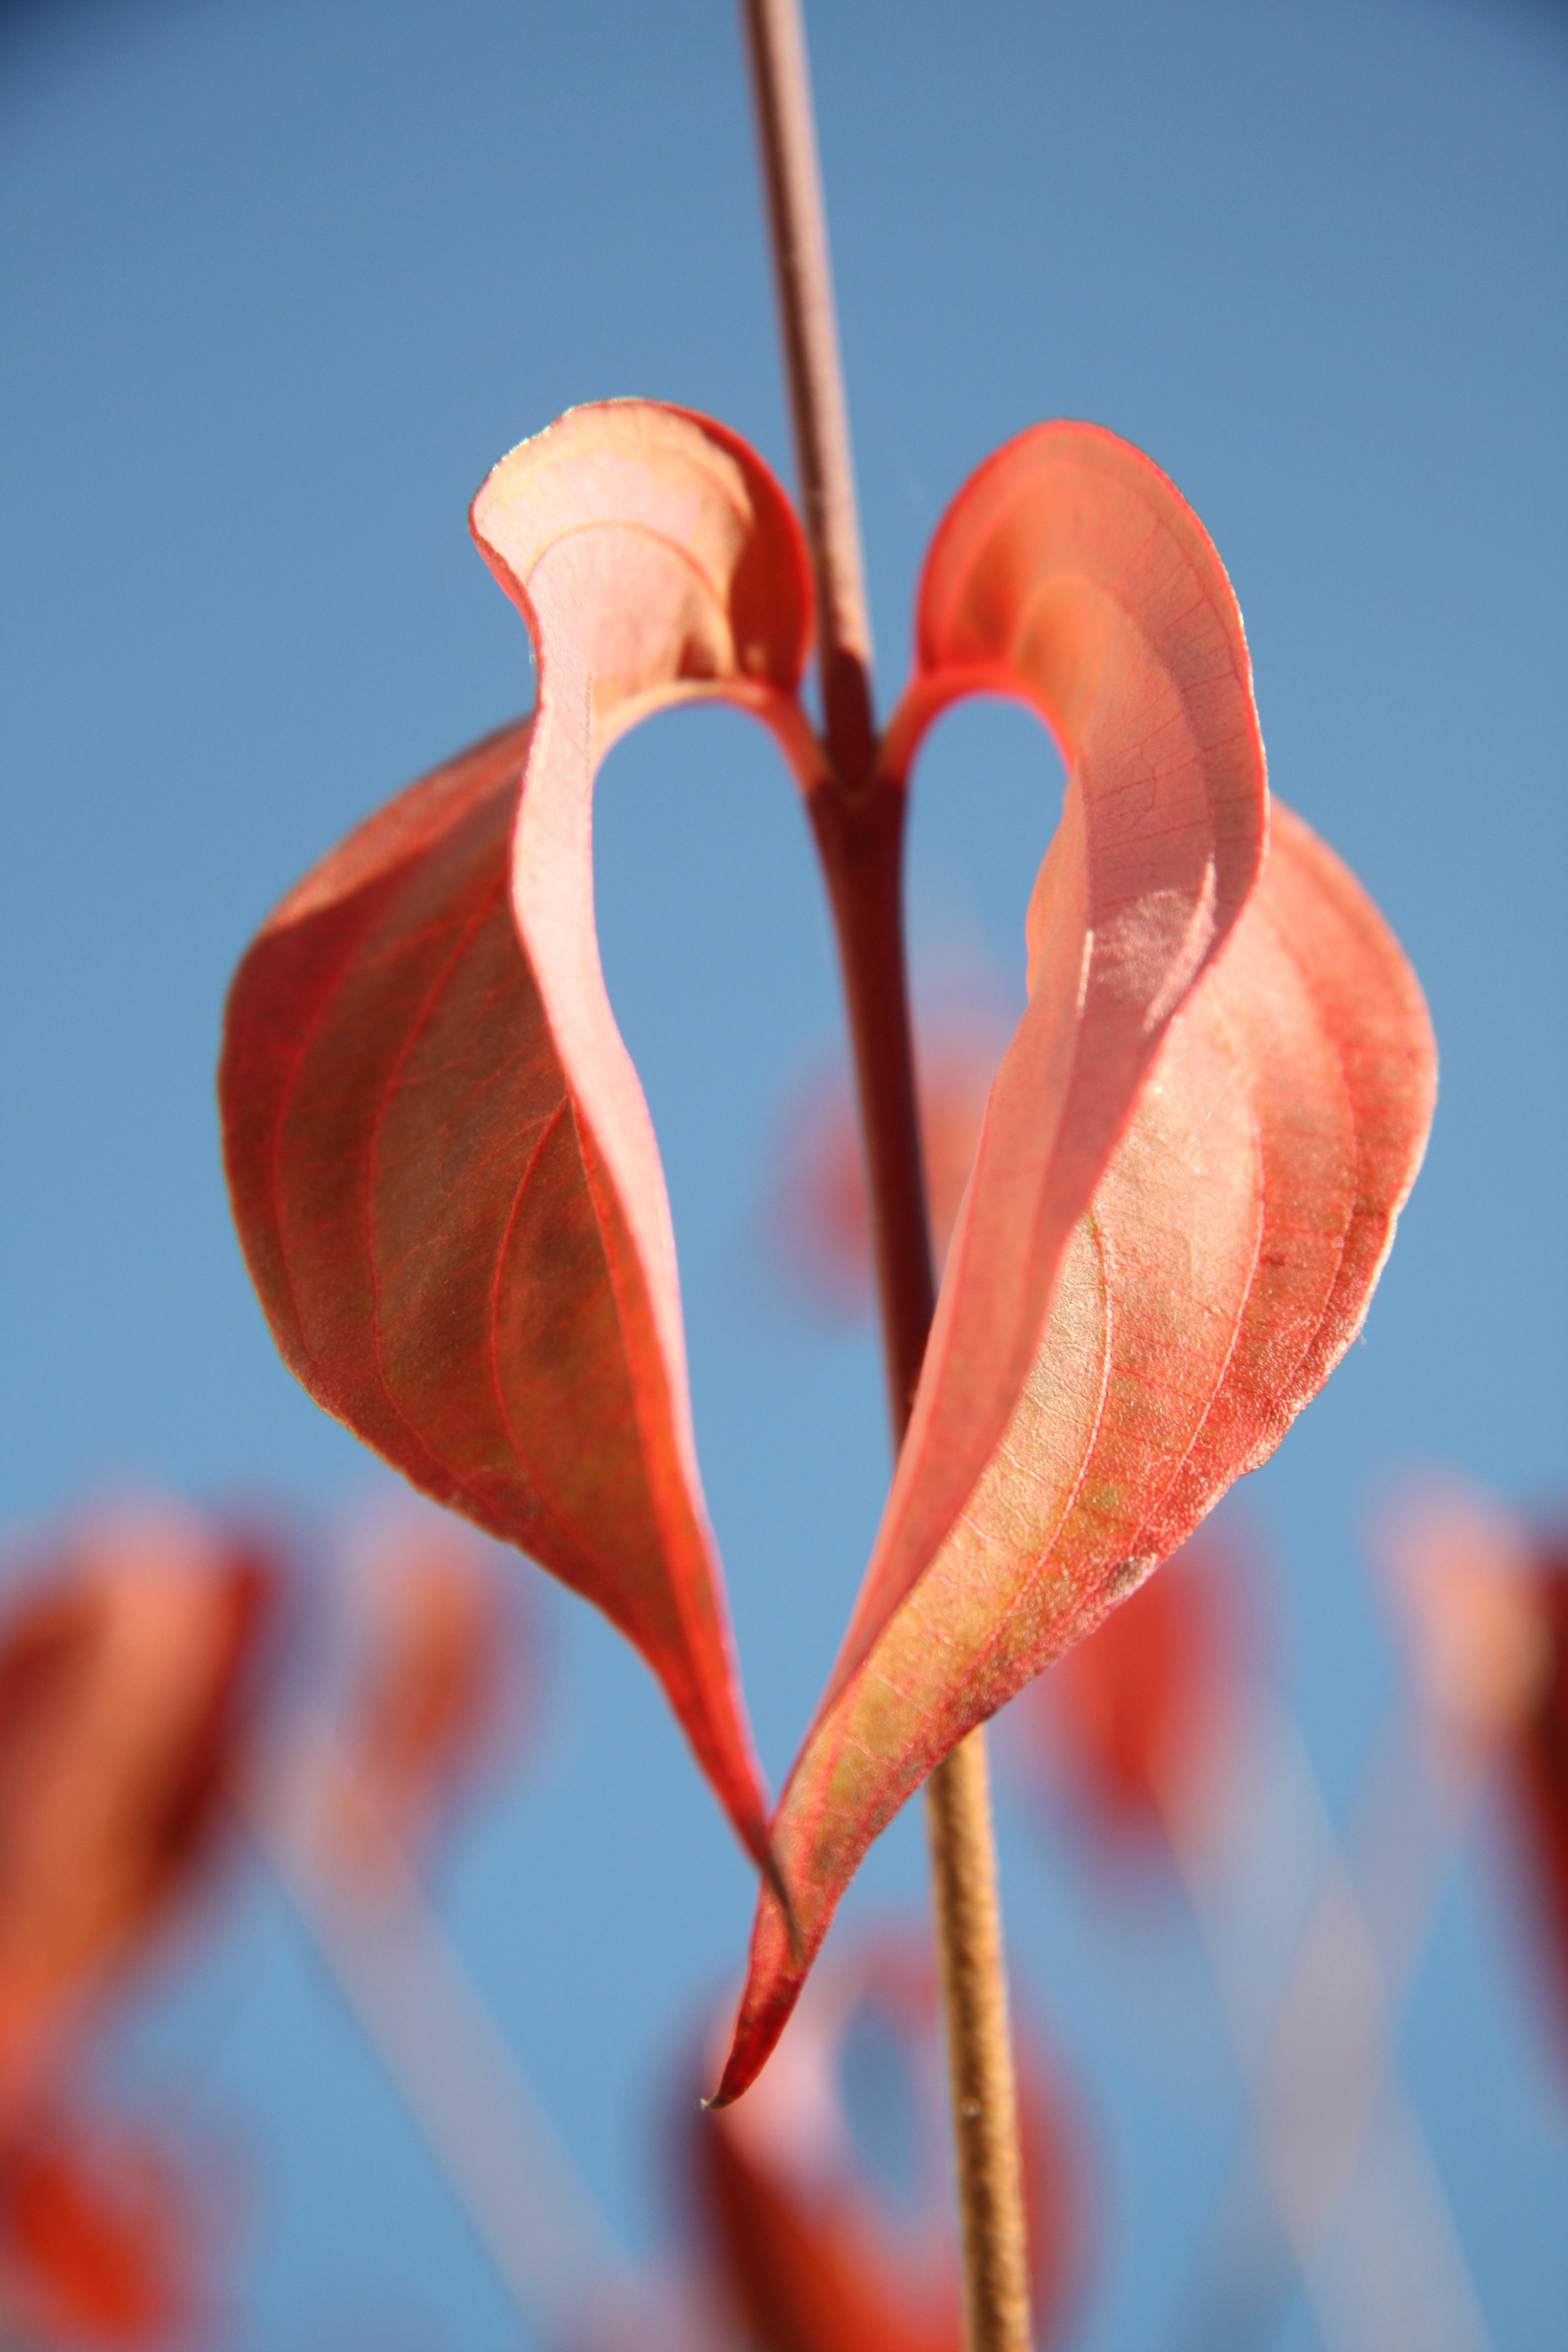 Free Images Leaf Flower Petal Love Red Symbol Romantic